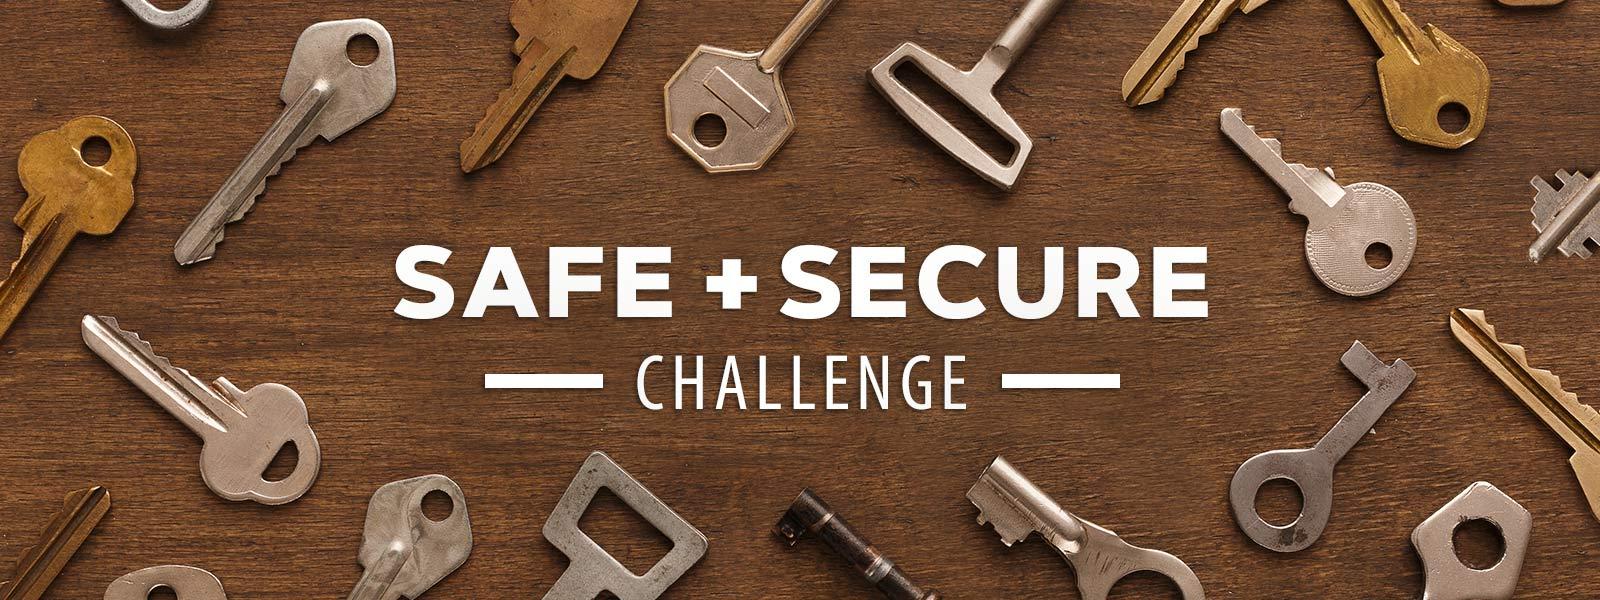 Safe and Secure Challenge